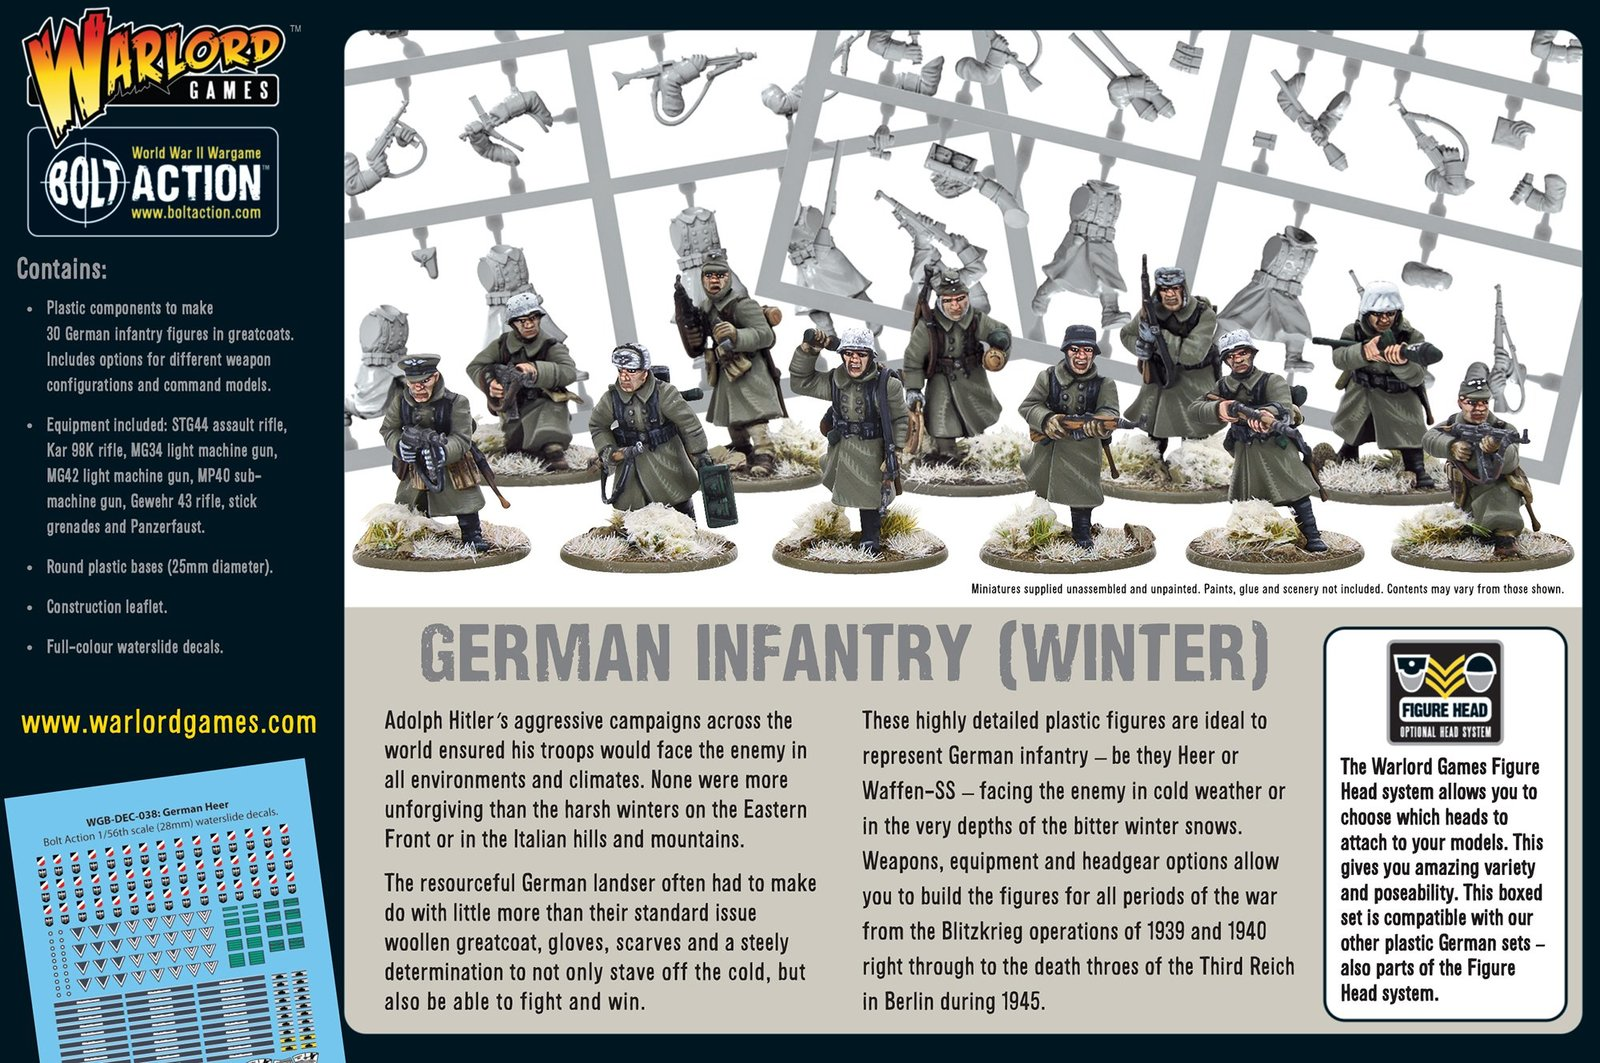 Germans Infantry (Winter) image